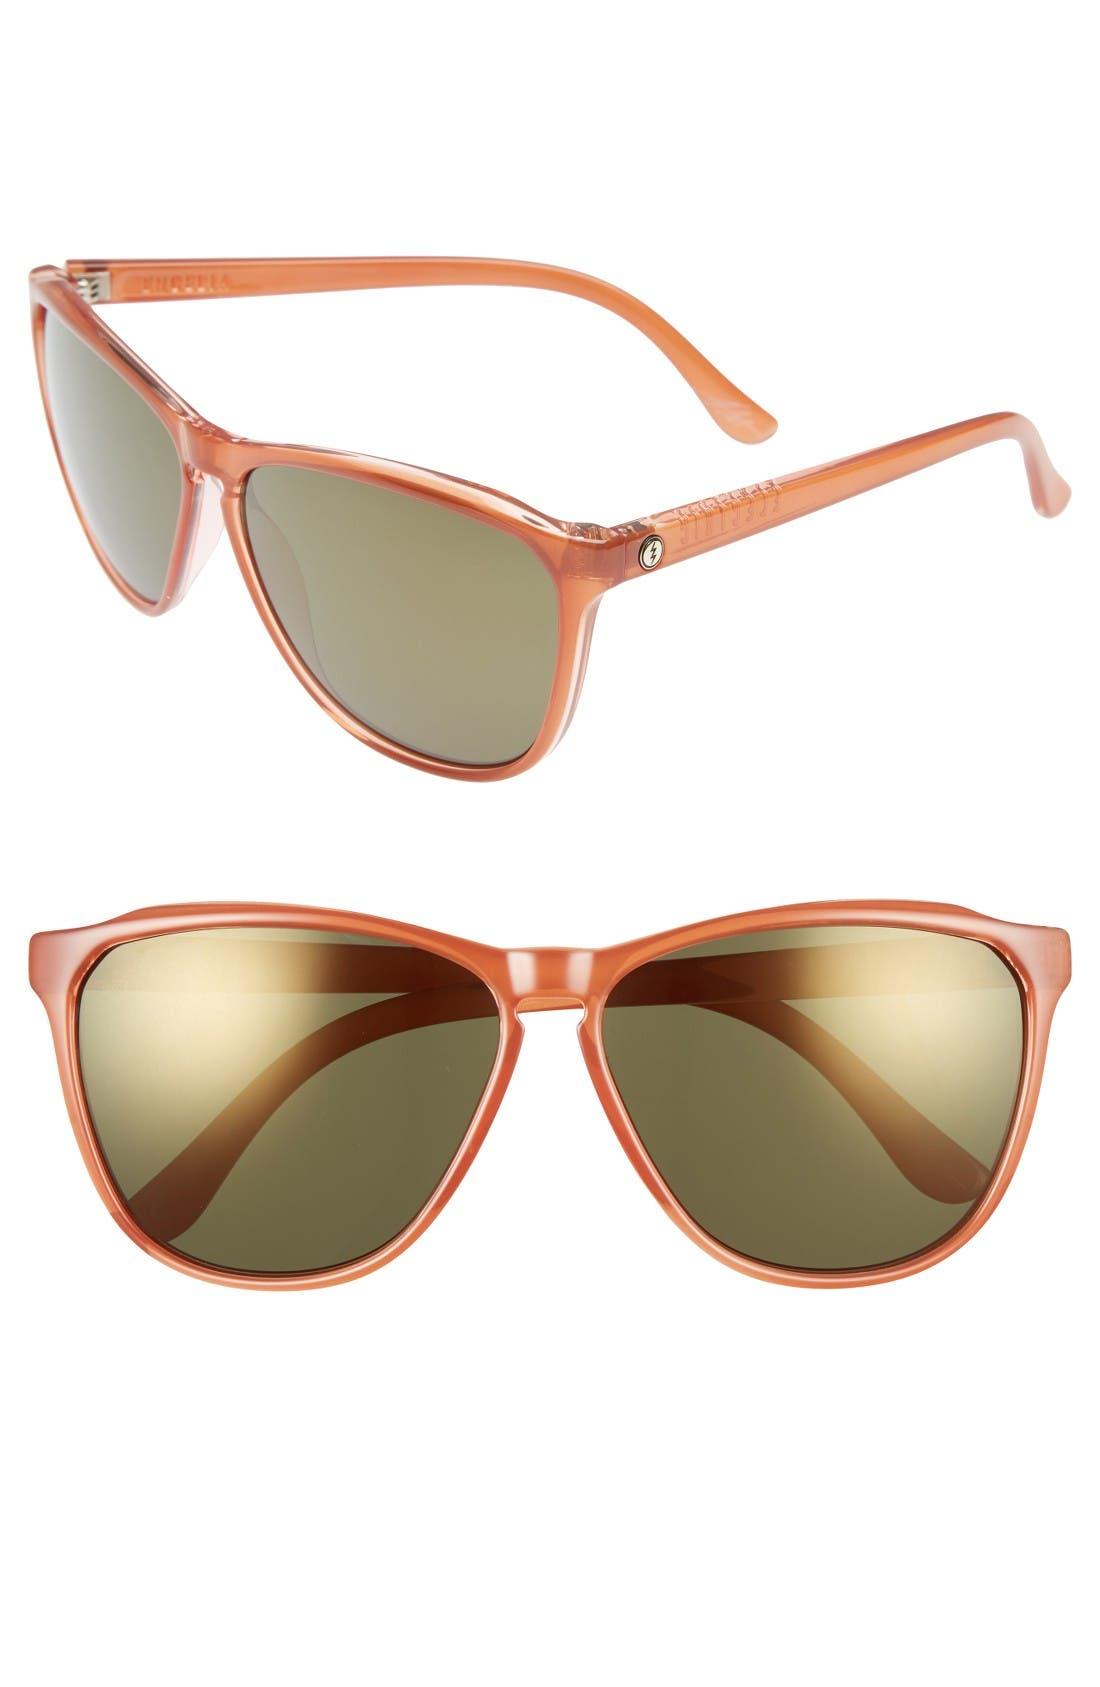 Alternate Image 1 Selected - ELECTRIC 'Encelia' 61mm Retro Sunglasses